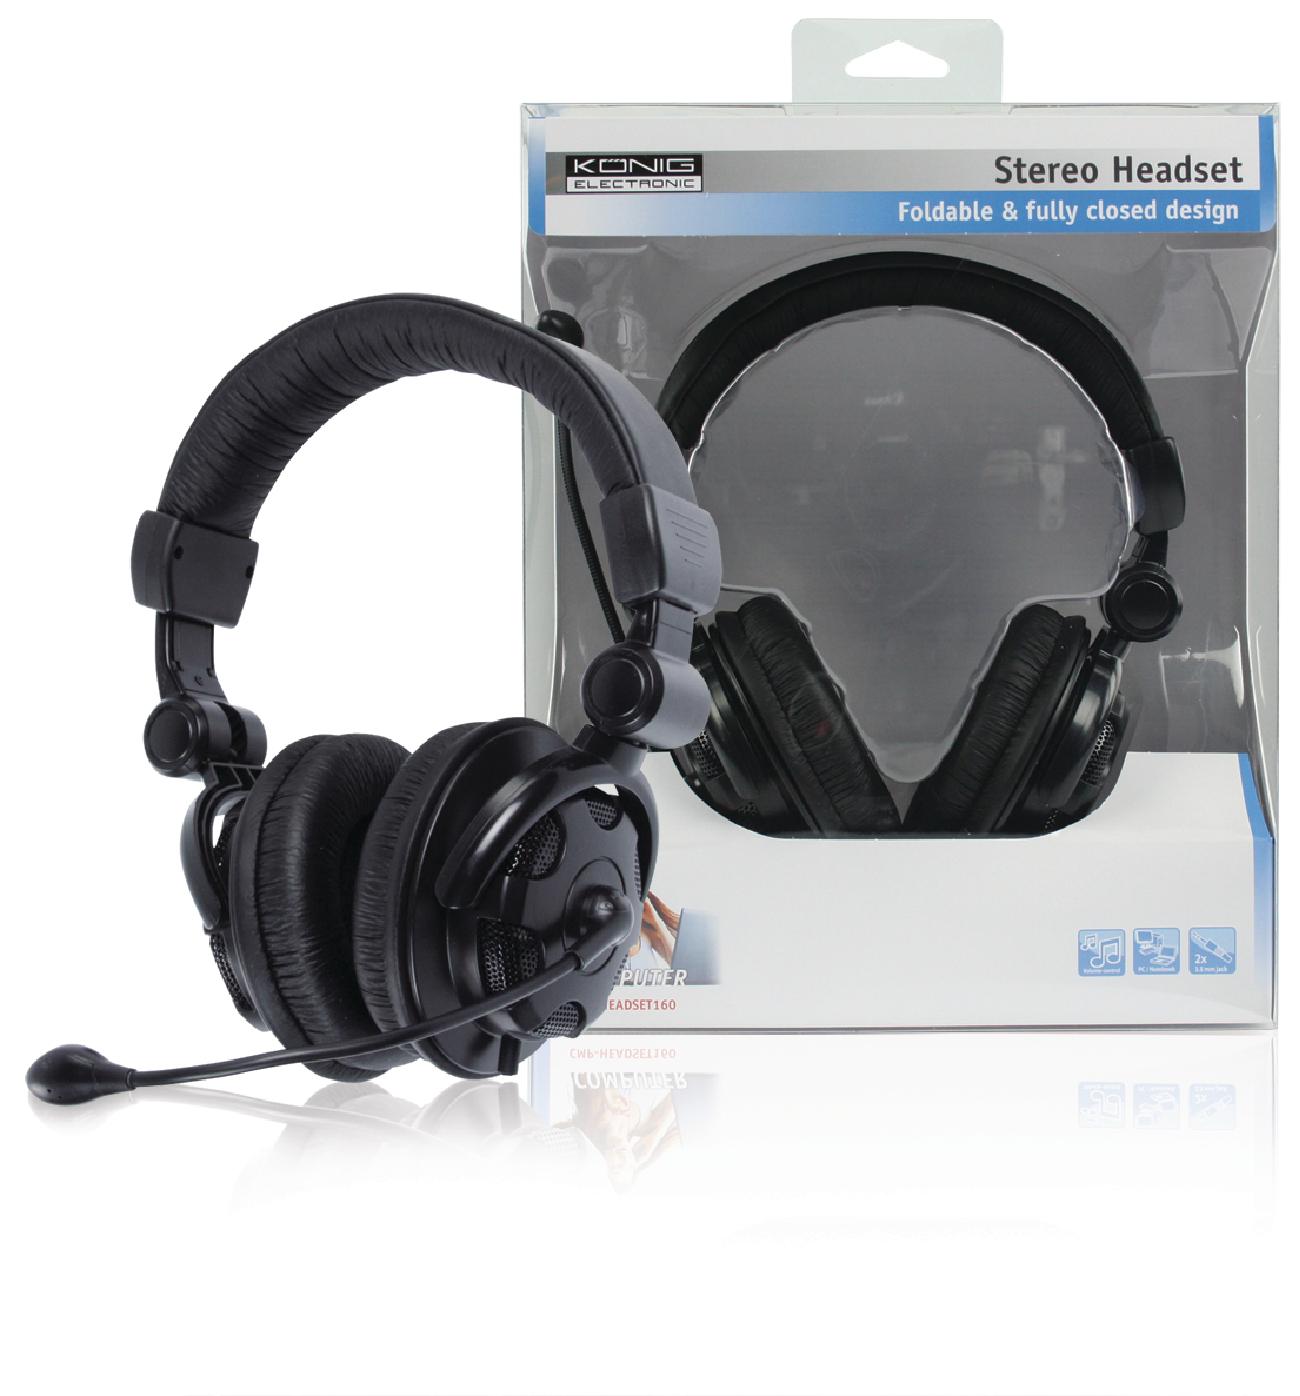 CMP-HEADSET160 - König - Headset Over-Ear 2x 3.5 mm Built-In Microphone  Black 5d7401e7ab43e